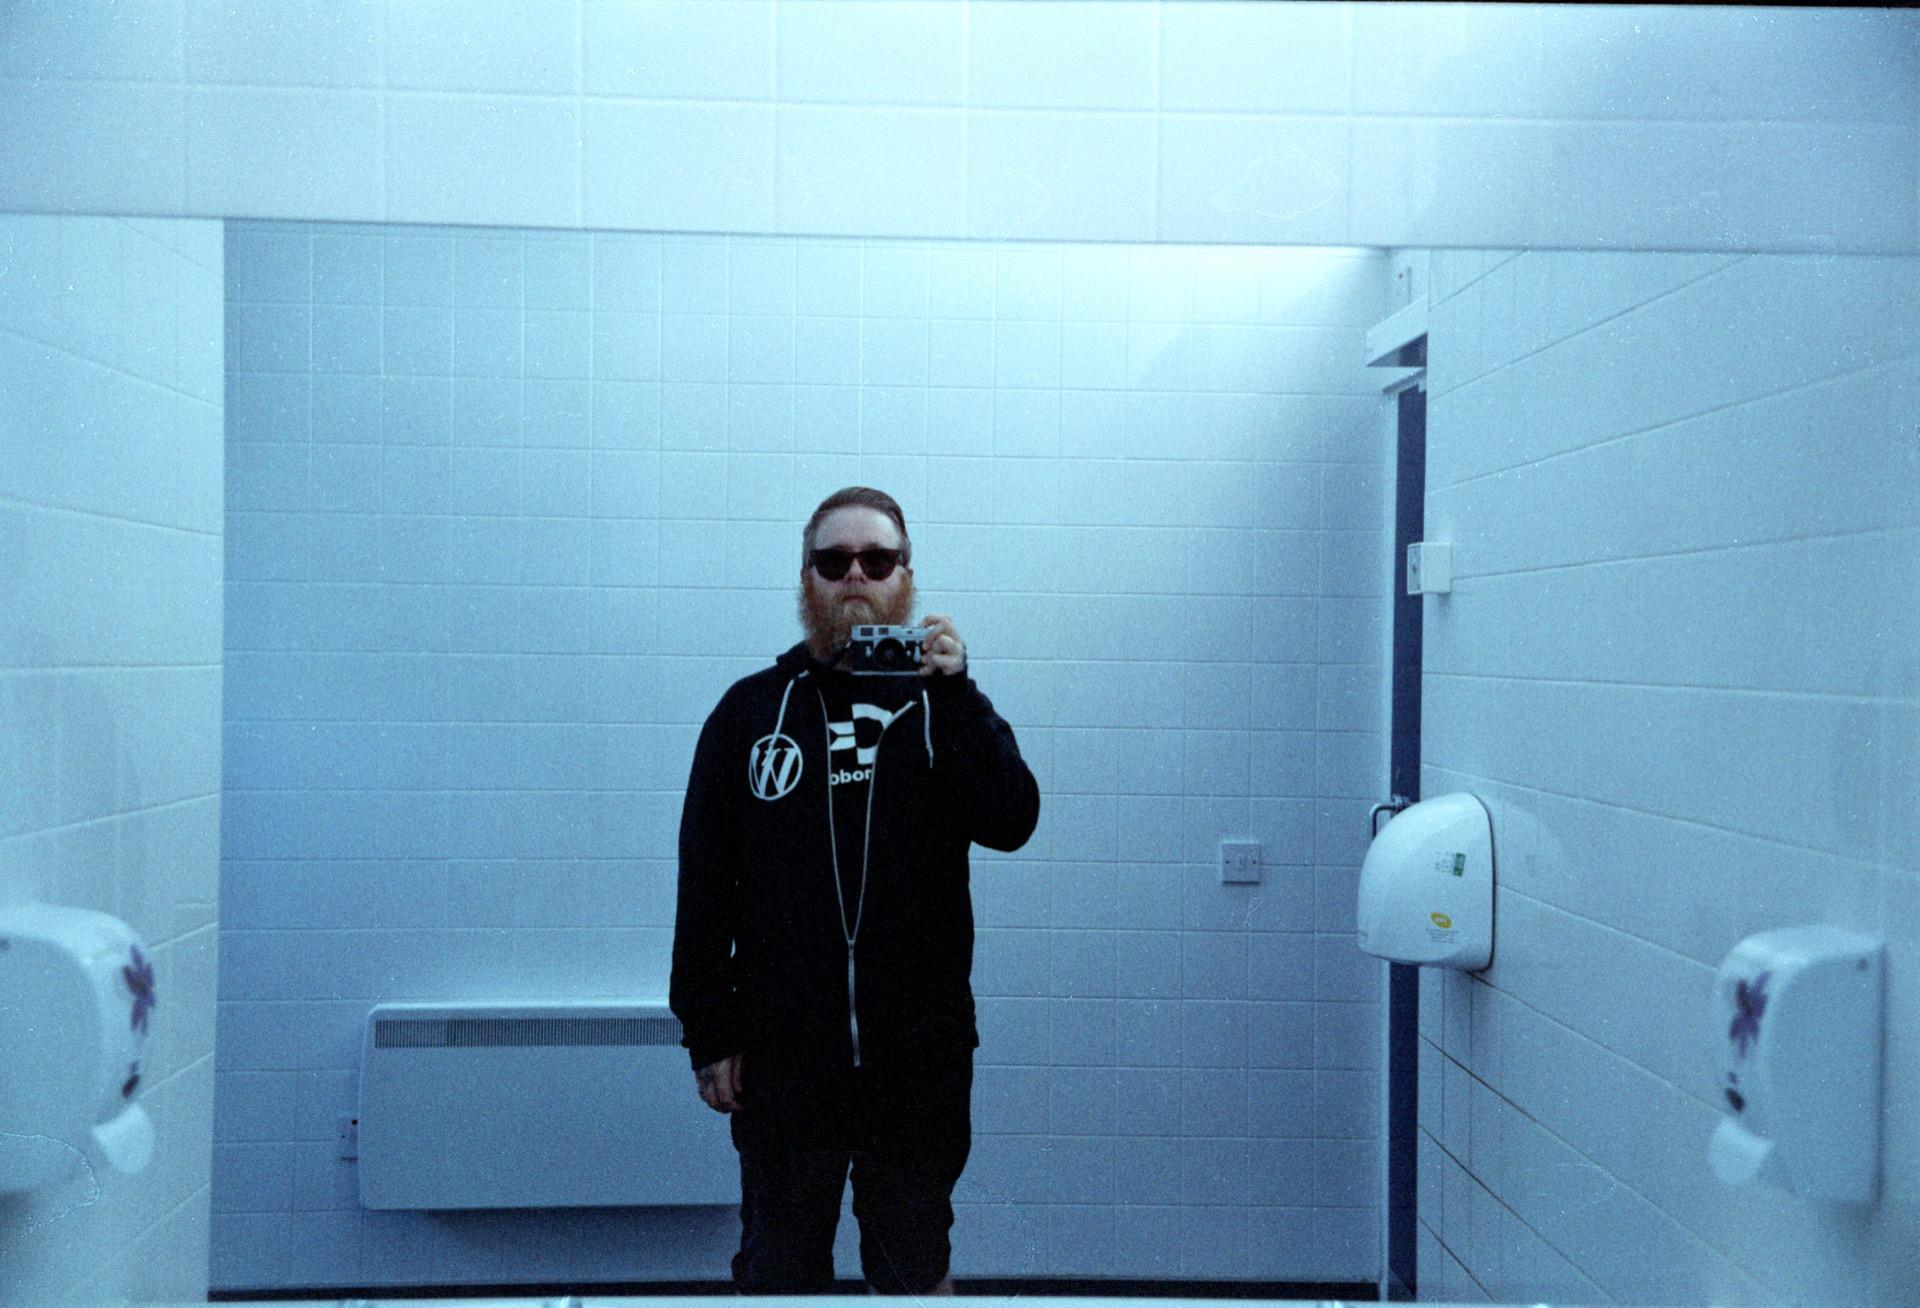 Jupiter 12 selfie